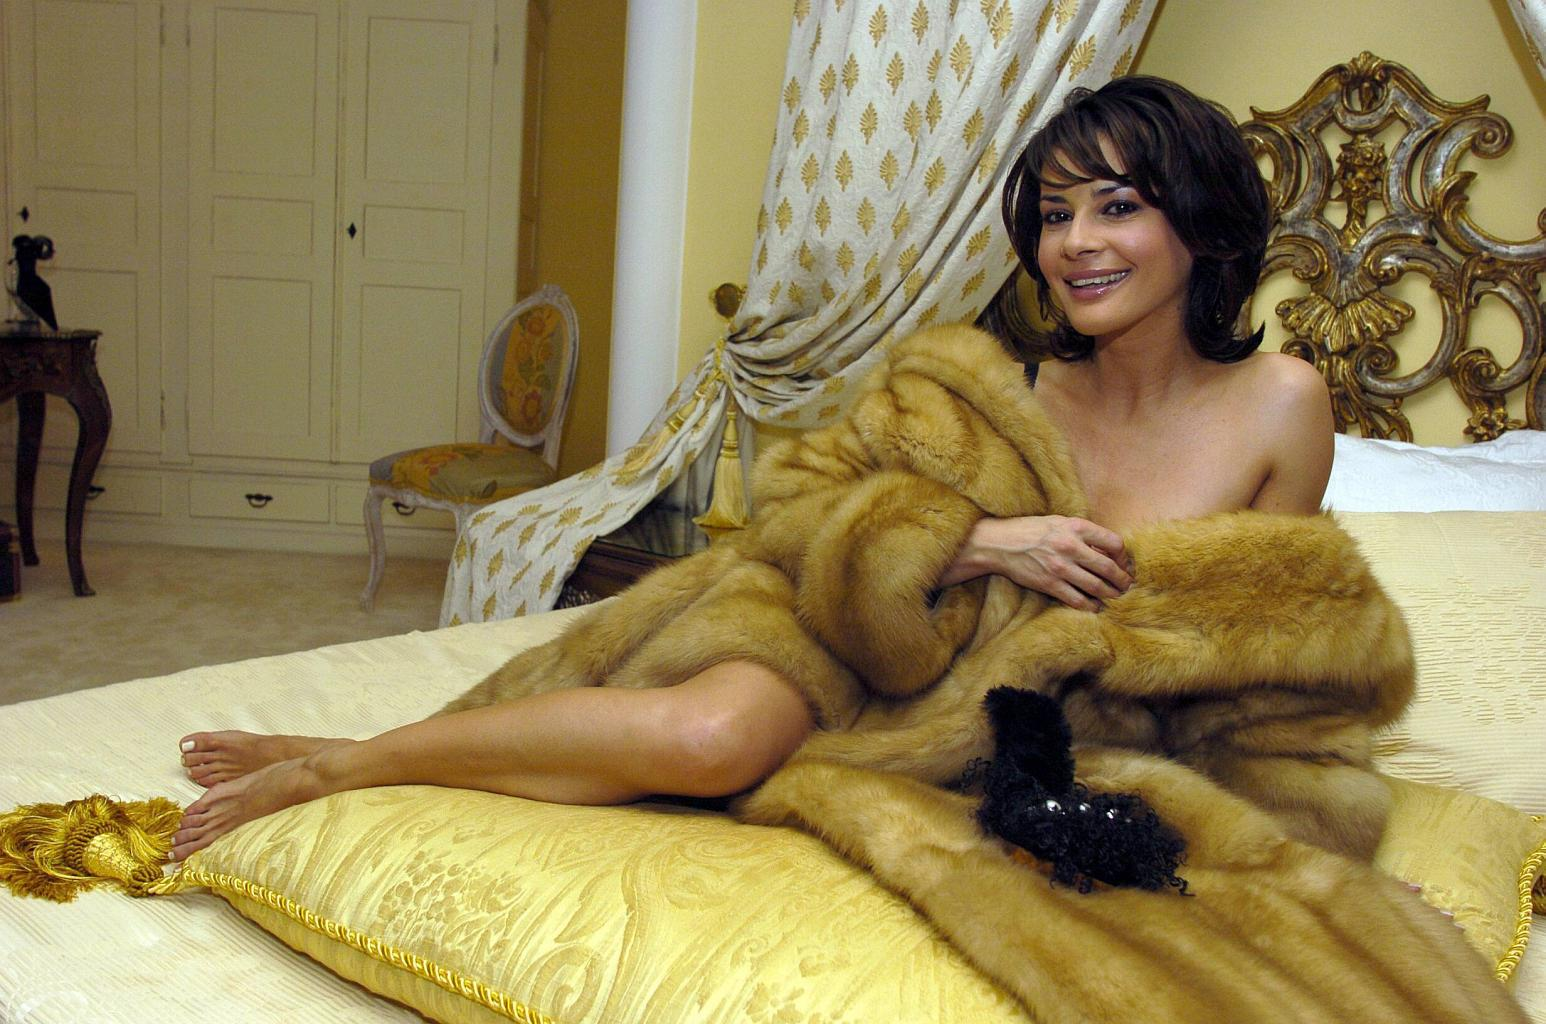 Gitta saxx nude once